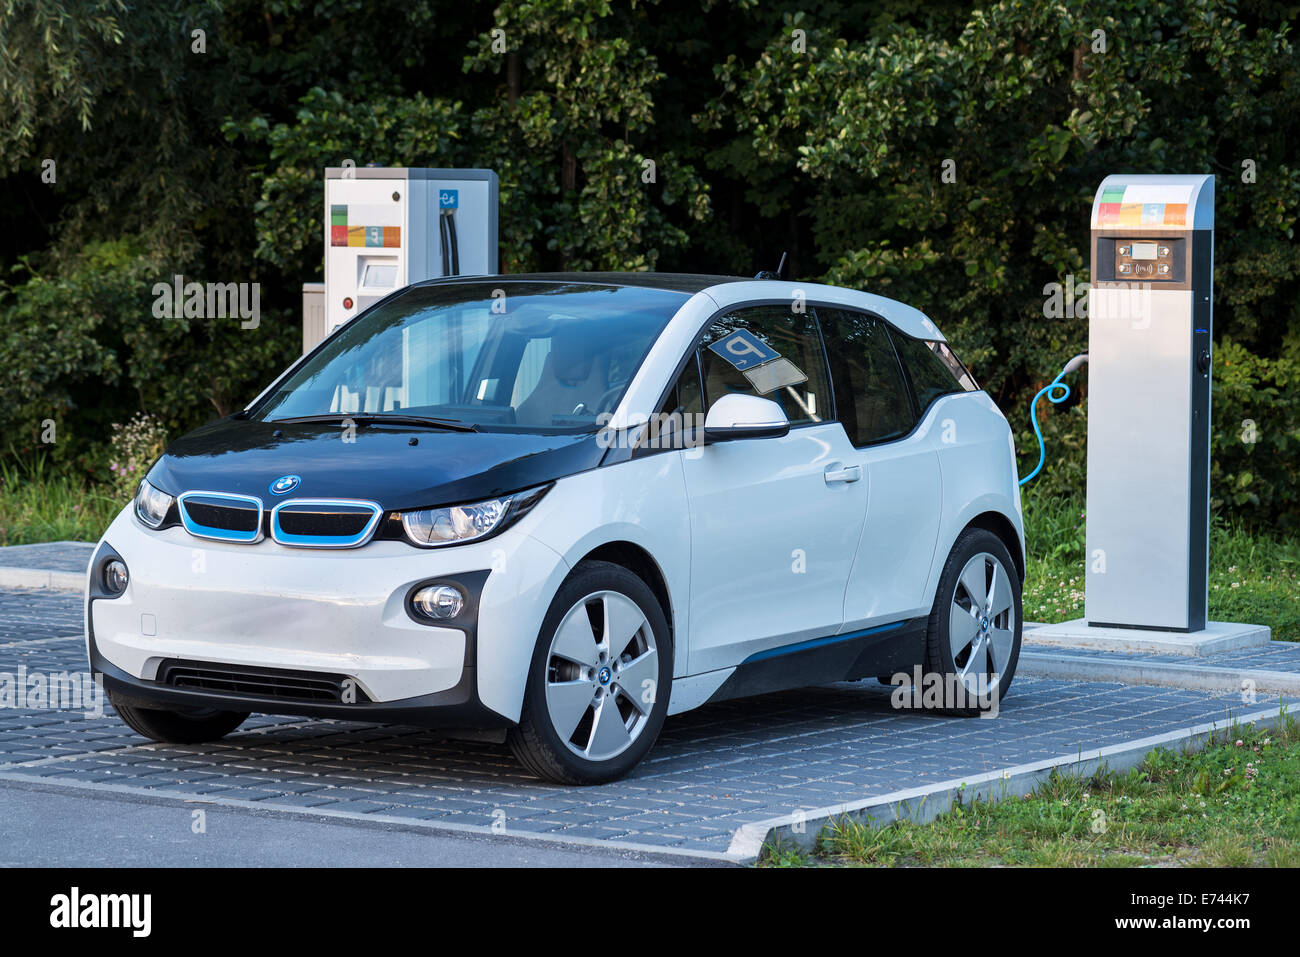 e car electro motor BMW tech technique safe power solar energy alternative energy Filling station Environment outdoor - Stock Image